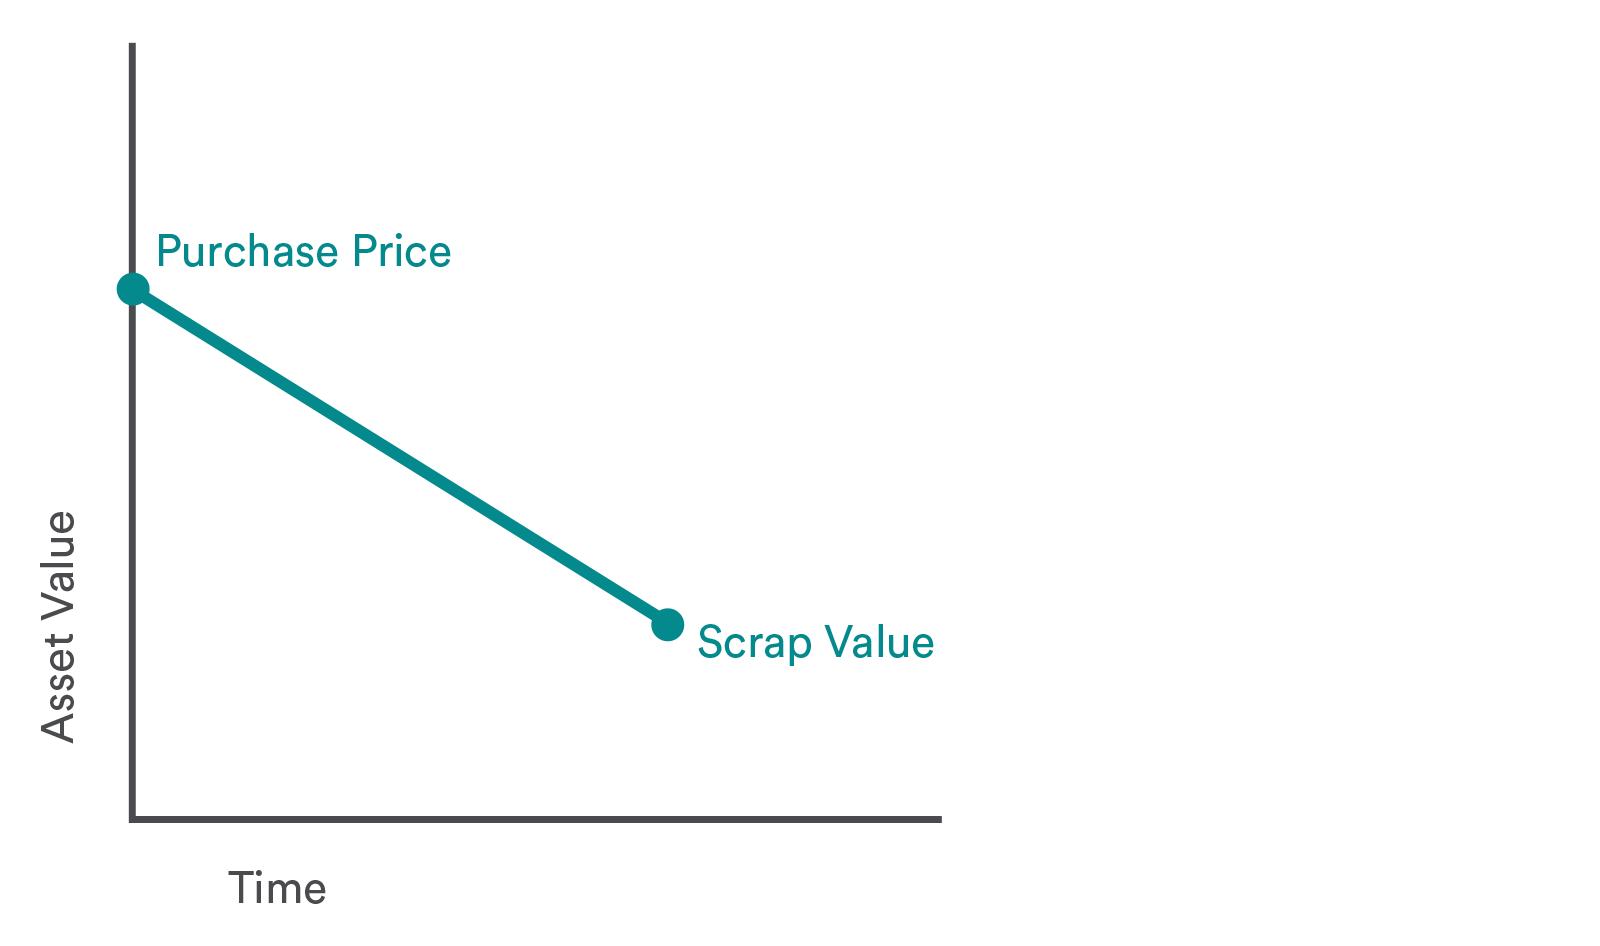 Straight Line Depreciation Graph